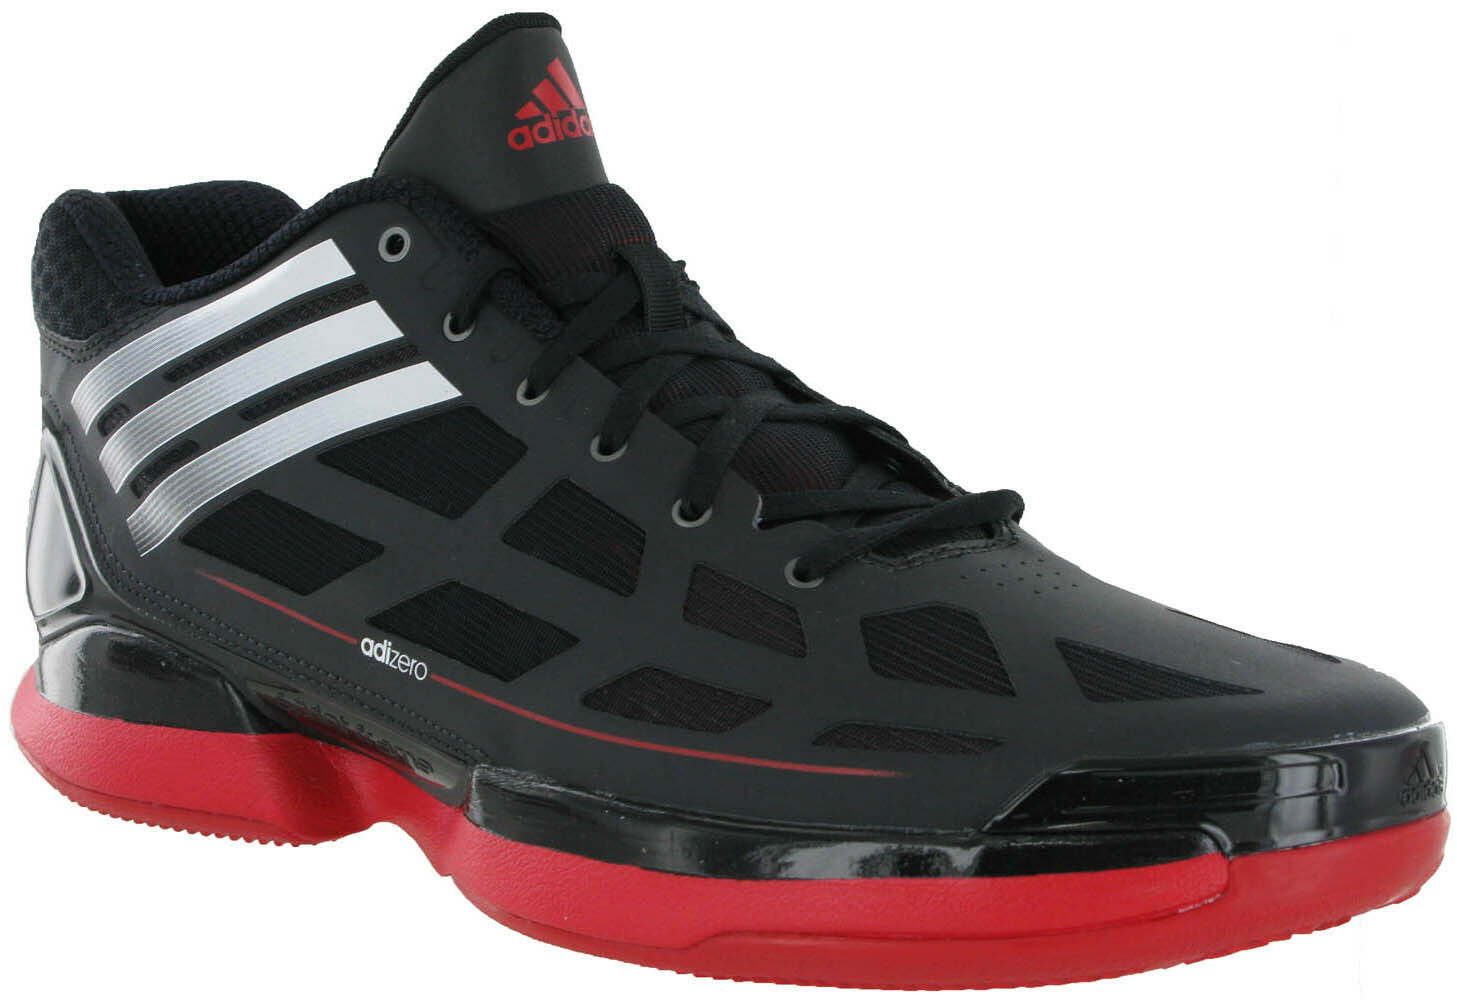 Adidas Crazy Light lo Deportes G49697 para hombre Casual Deportes lo Fitness Entrenadores de Baloncesto 8db81e